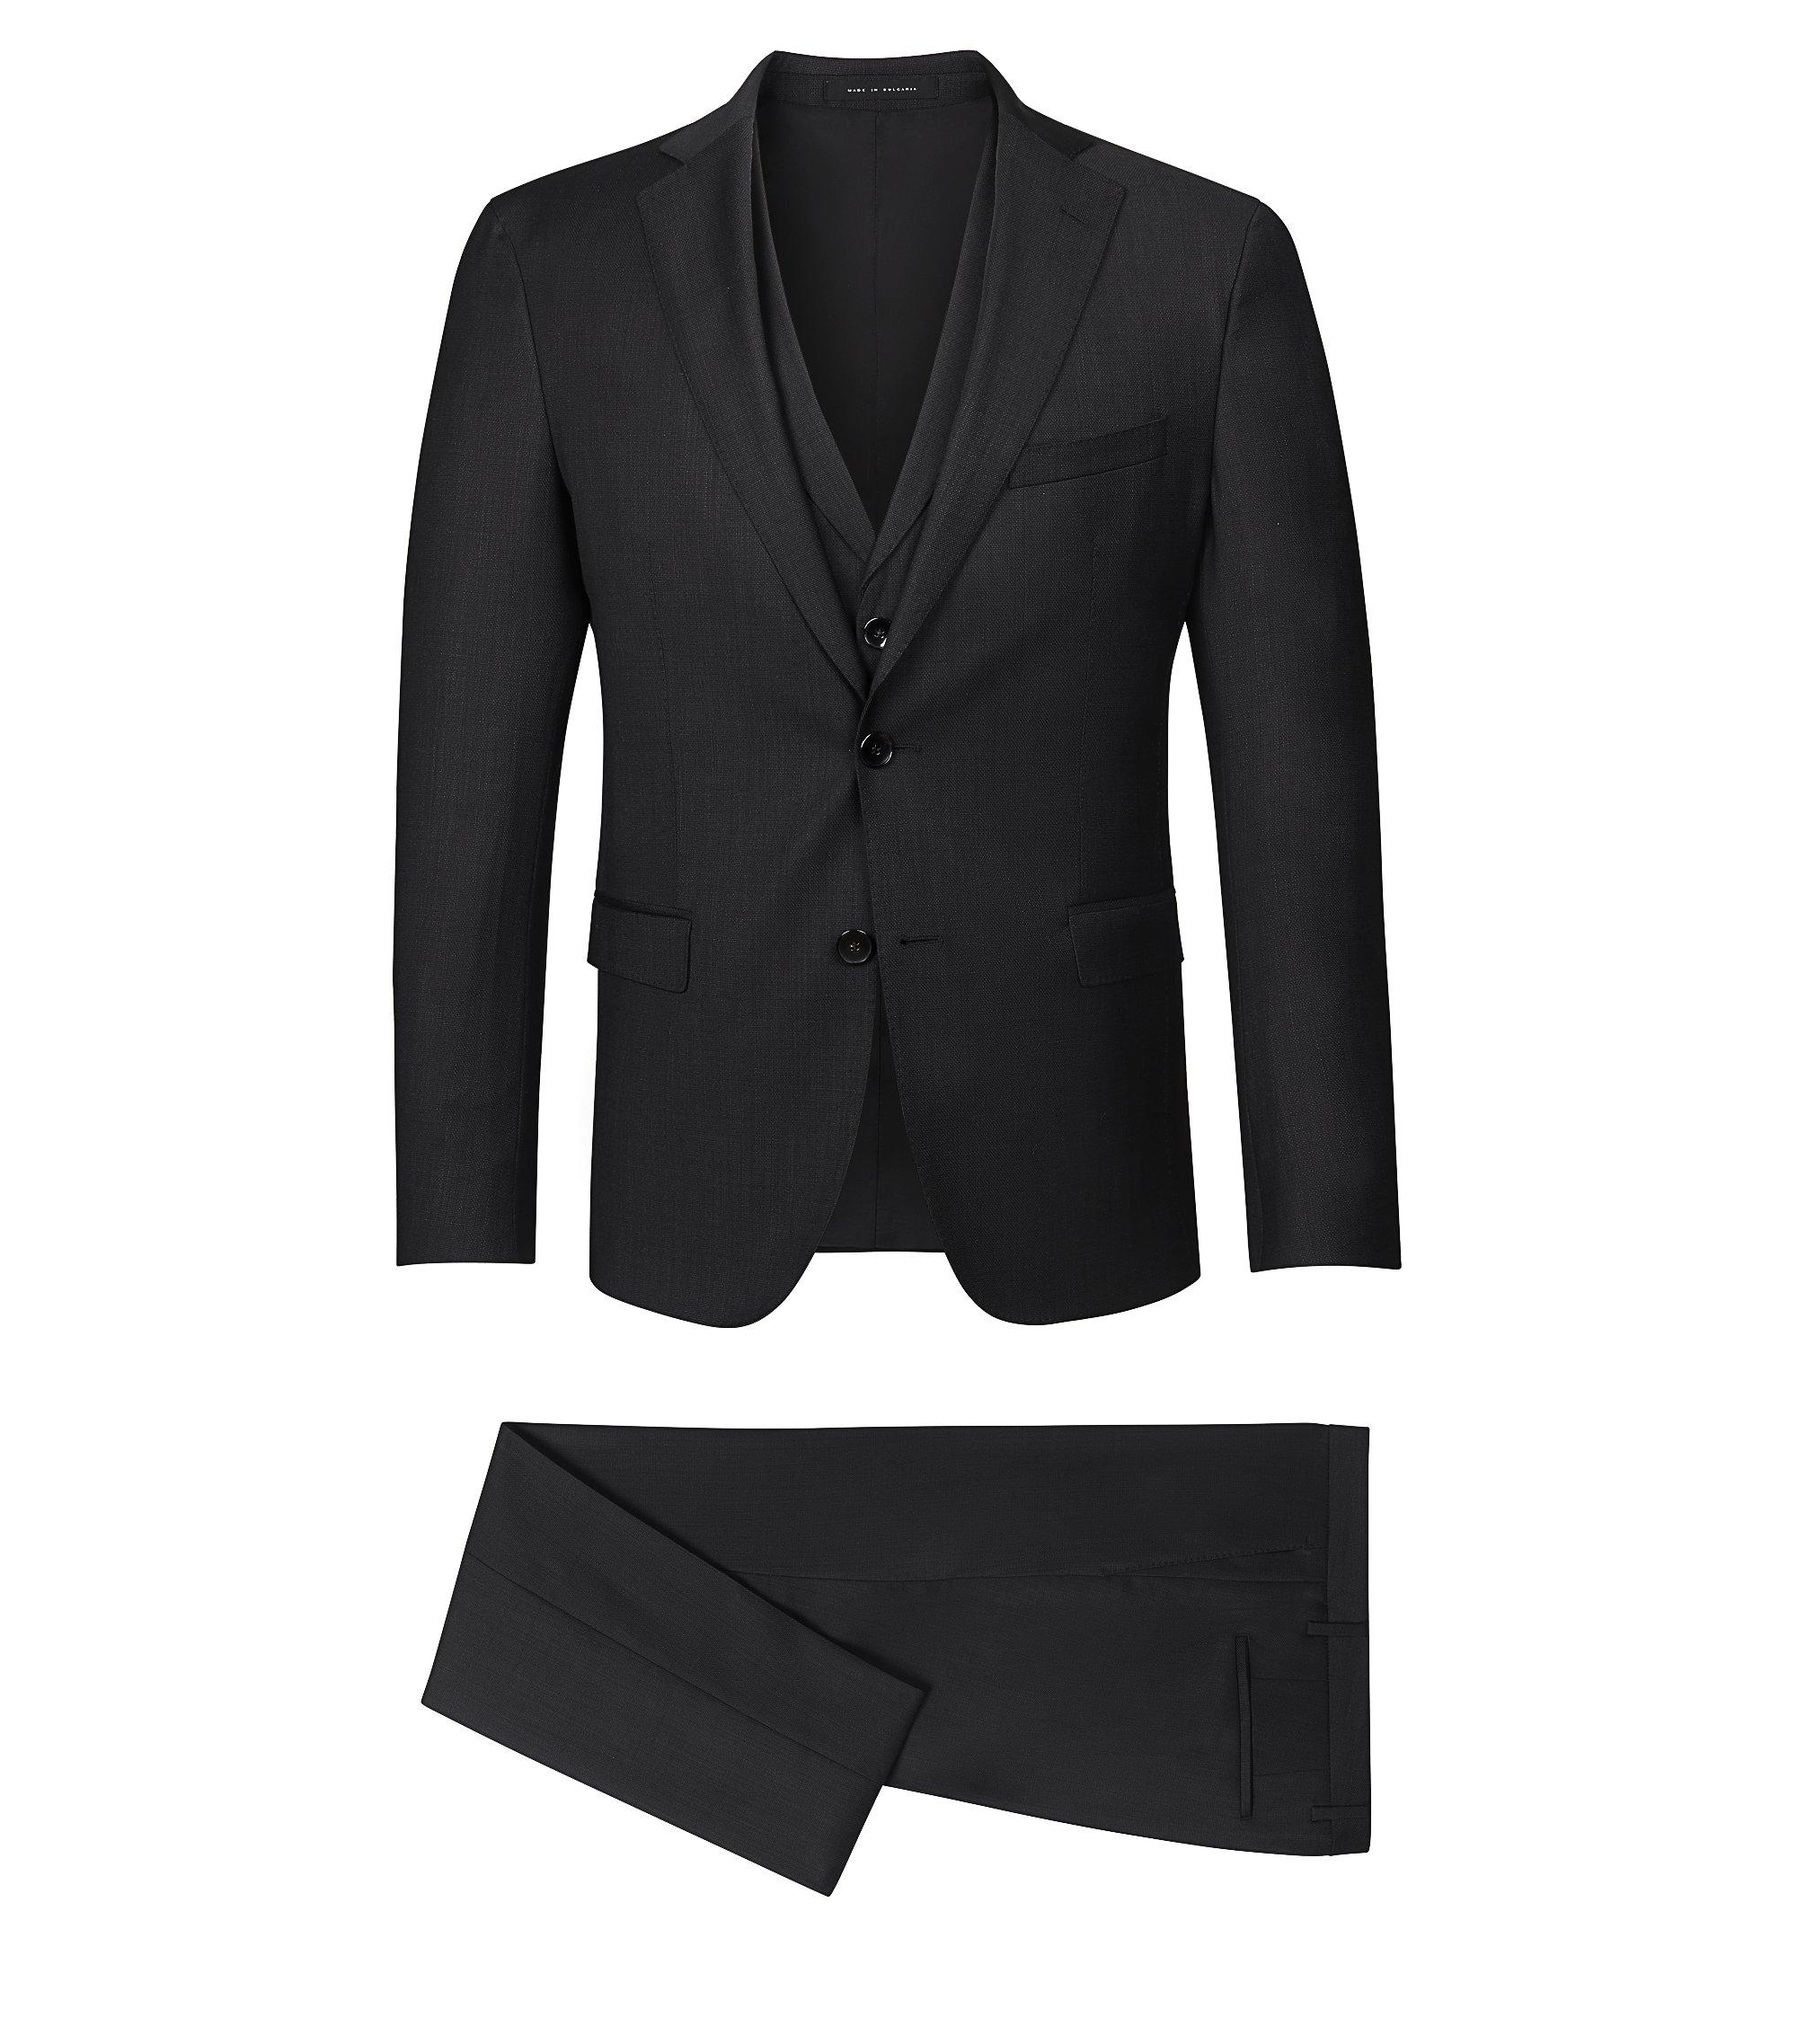 Stretch Virgin Wool Blend 3-Piece Suit, Extra-Slim Fit | Reyno/Wave WE, Black